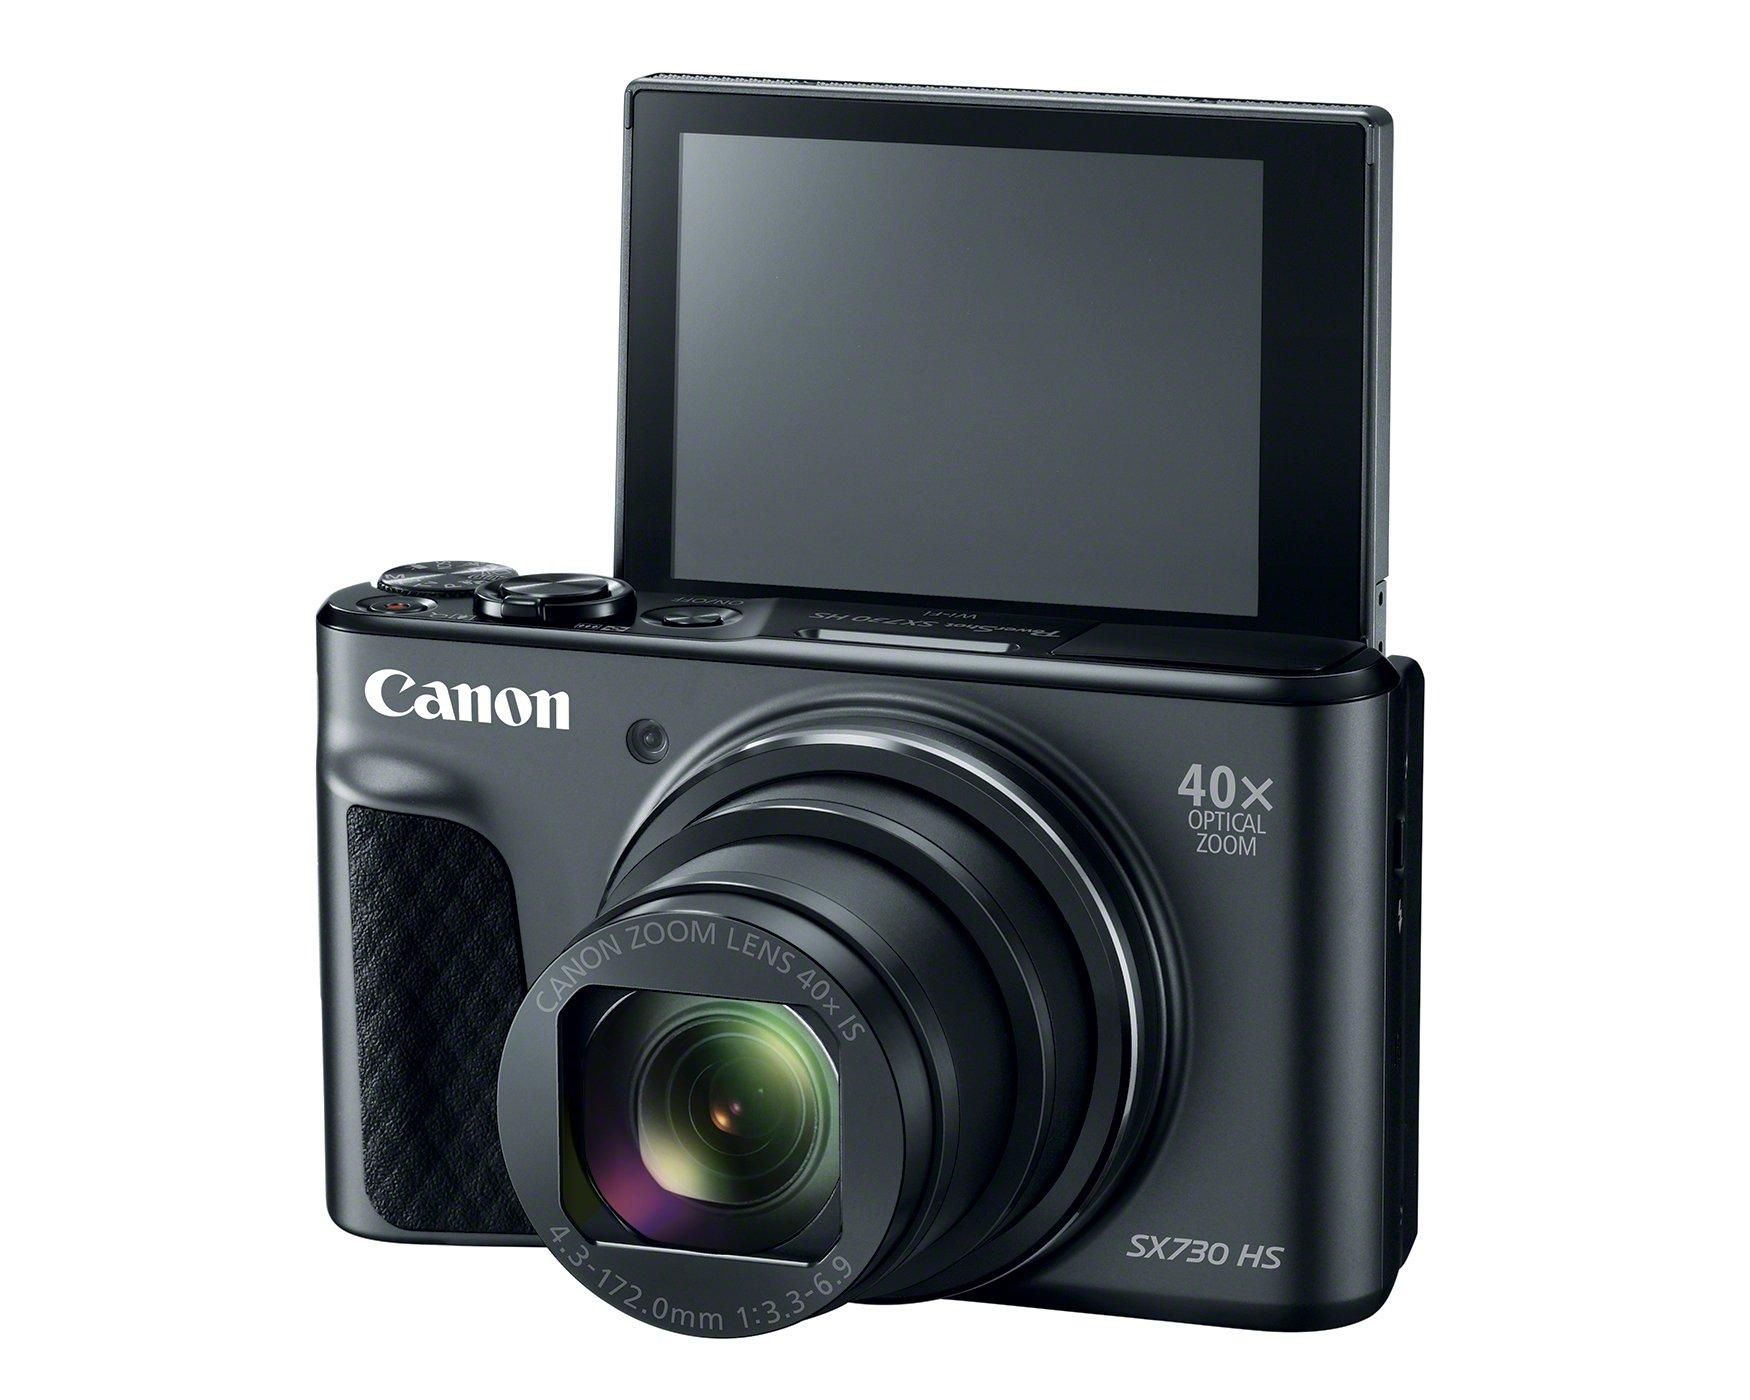 canon powershot sx730 digital camera. Black Bedroom Furniture Sets. Home Design Ideas